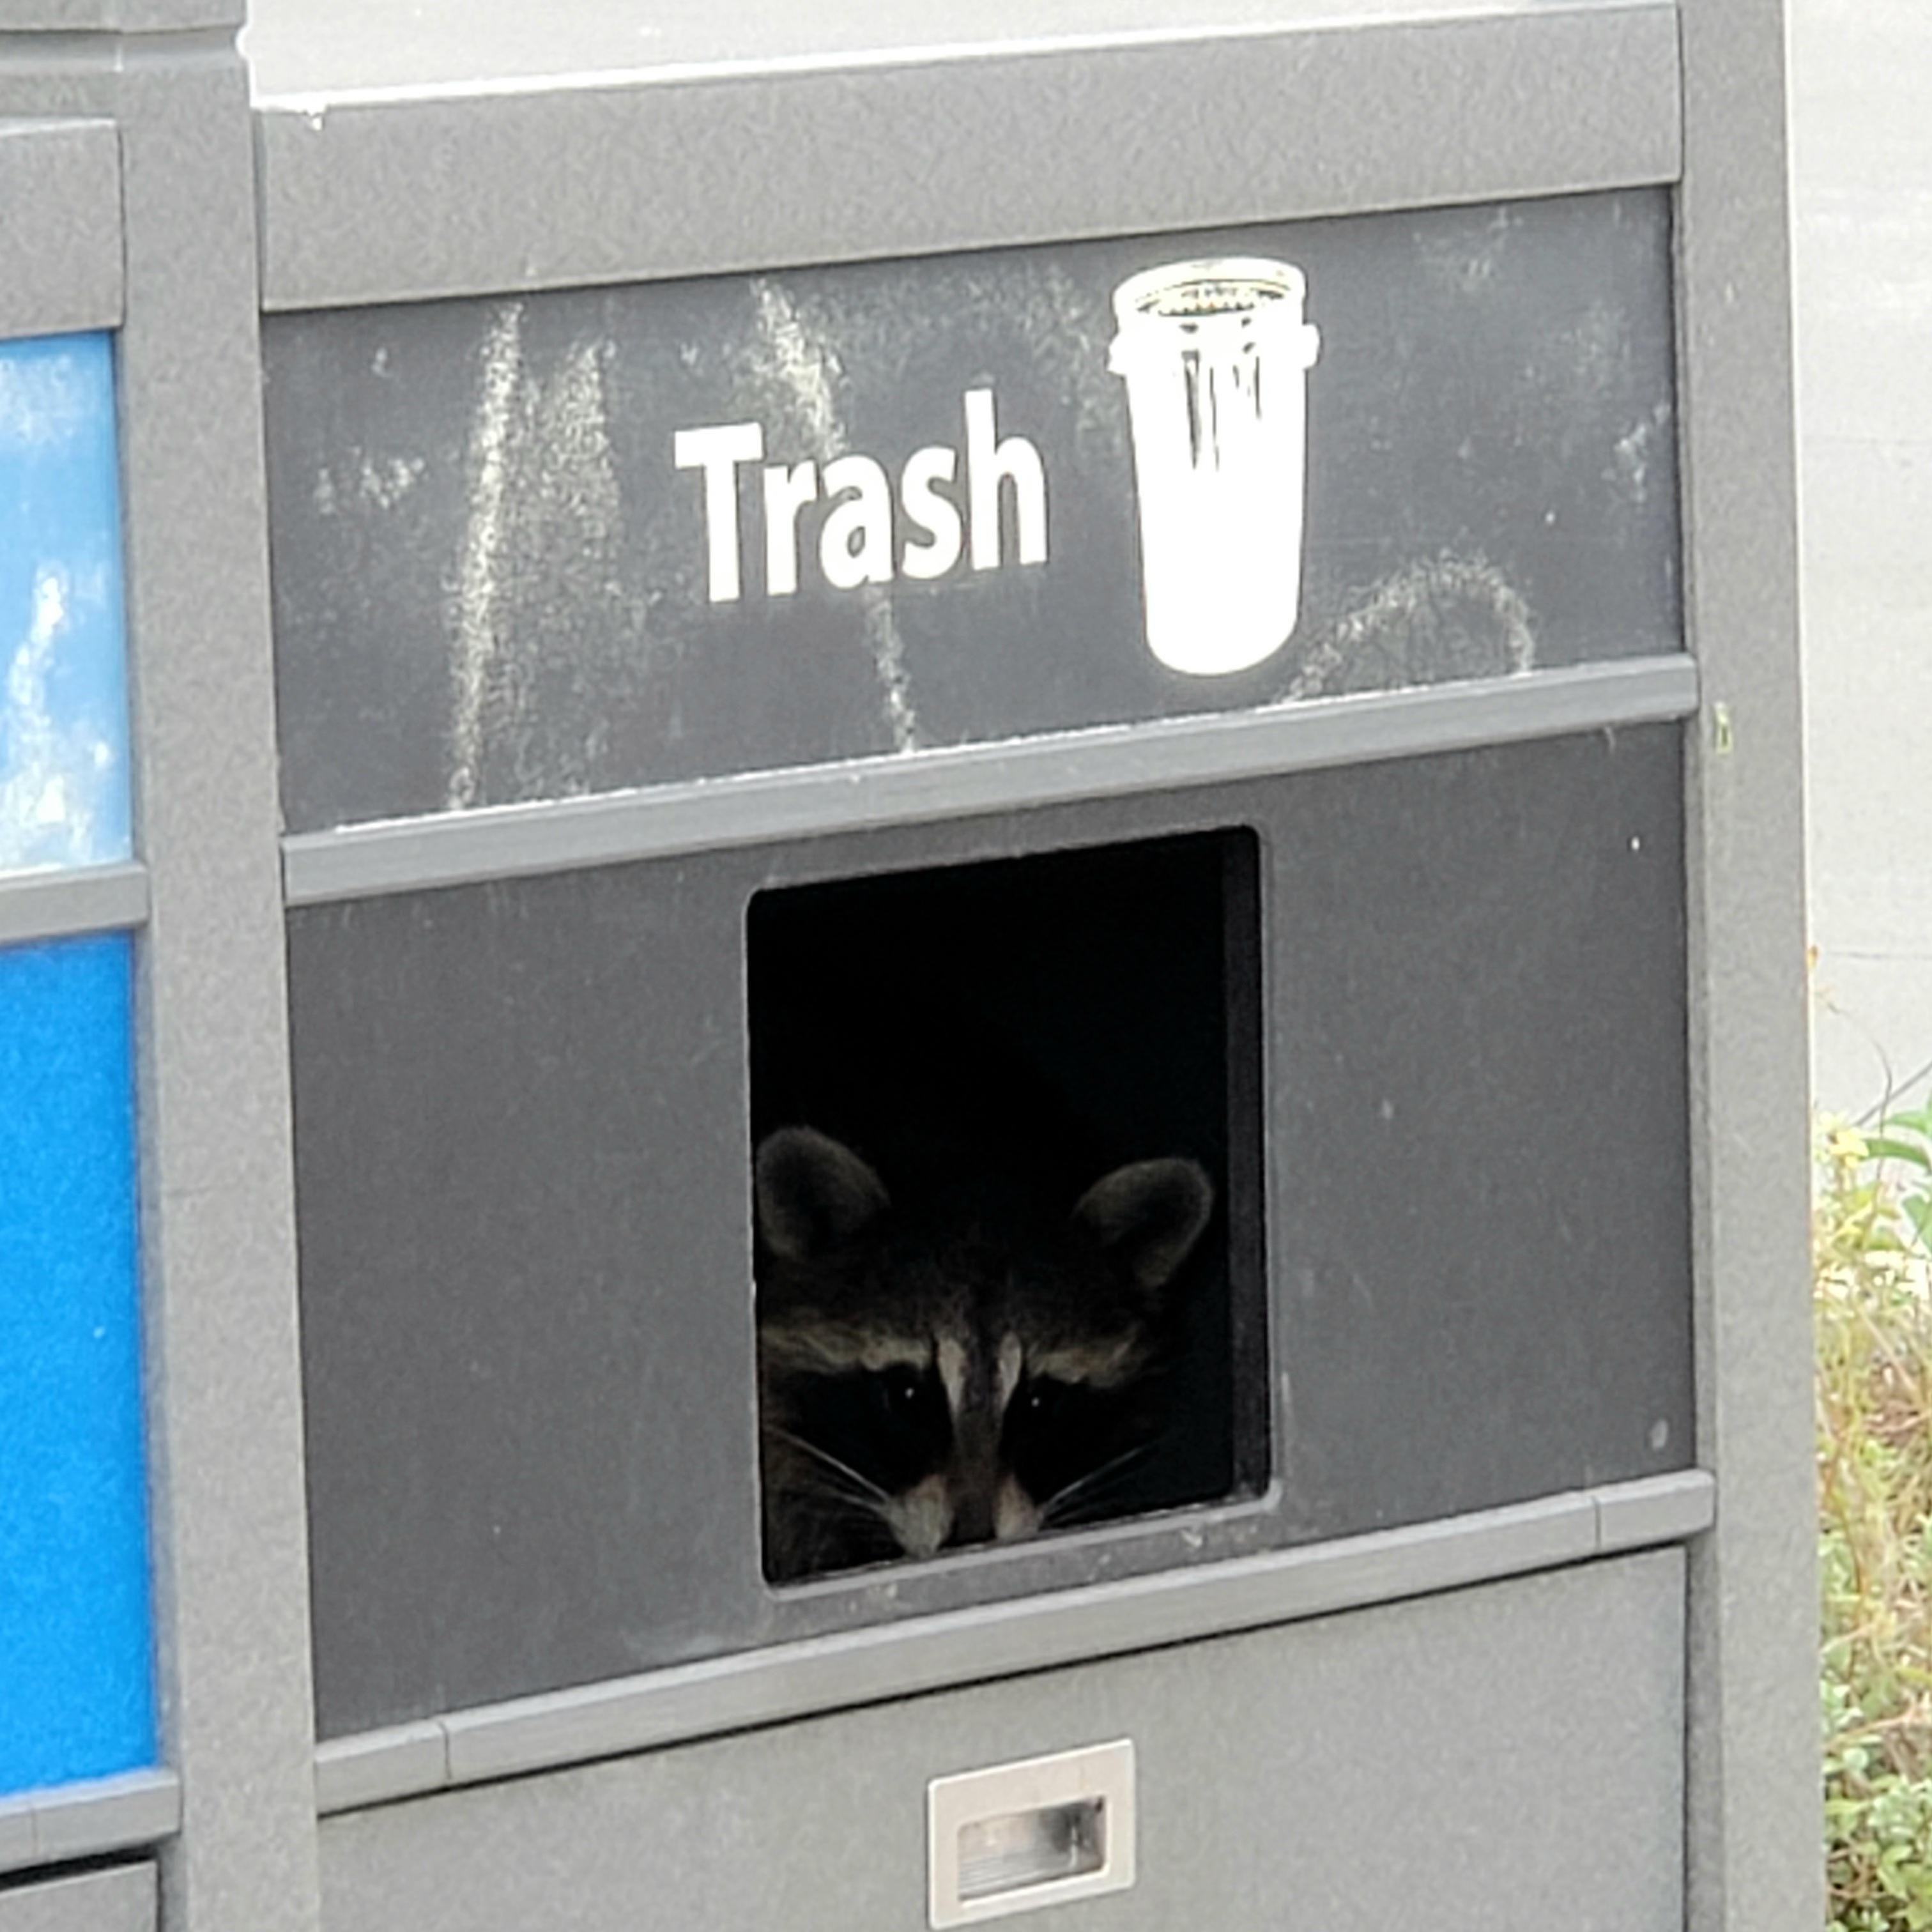 Trash Panda found his home.